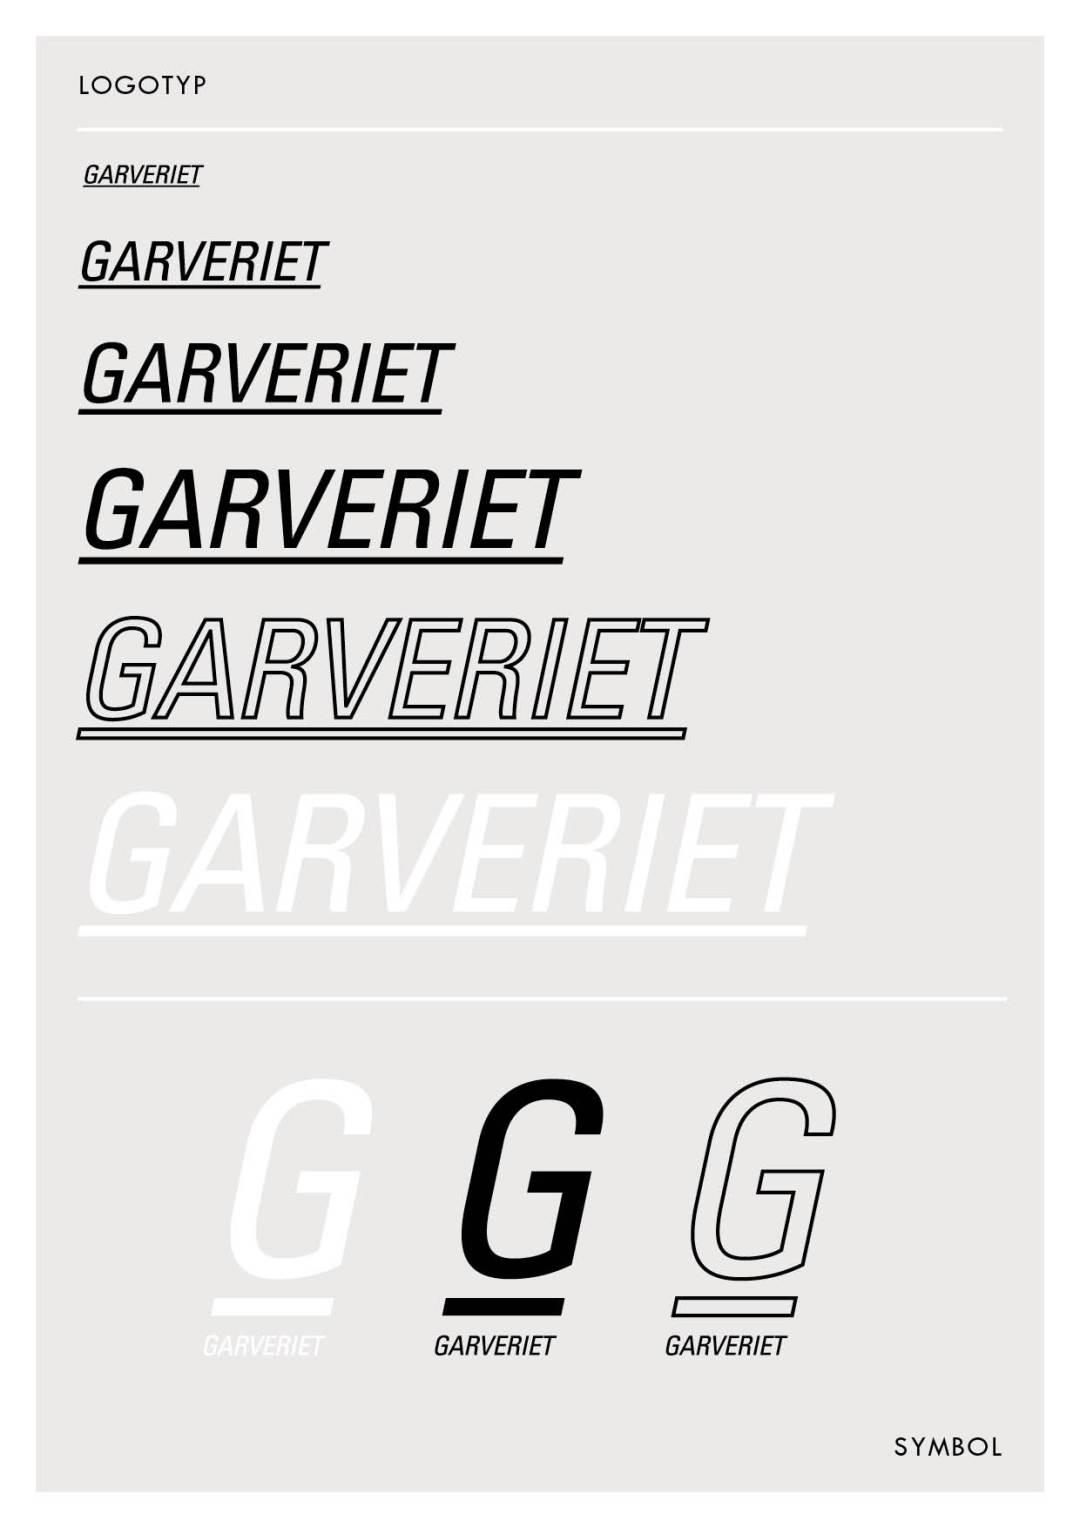 grafisk-profil-garveriet-20184